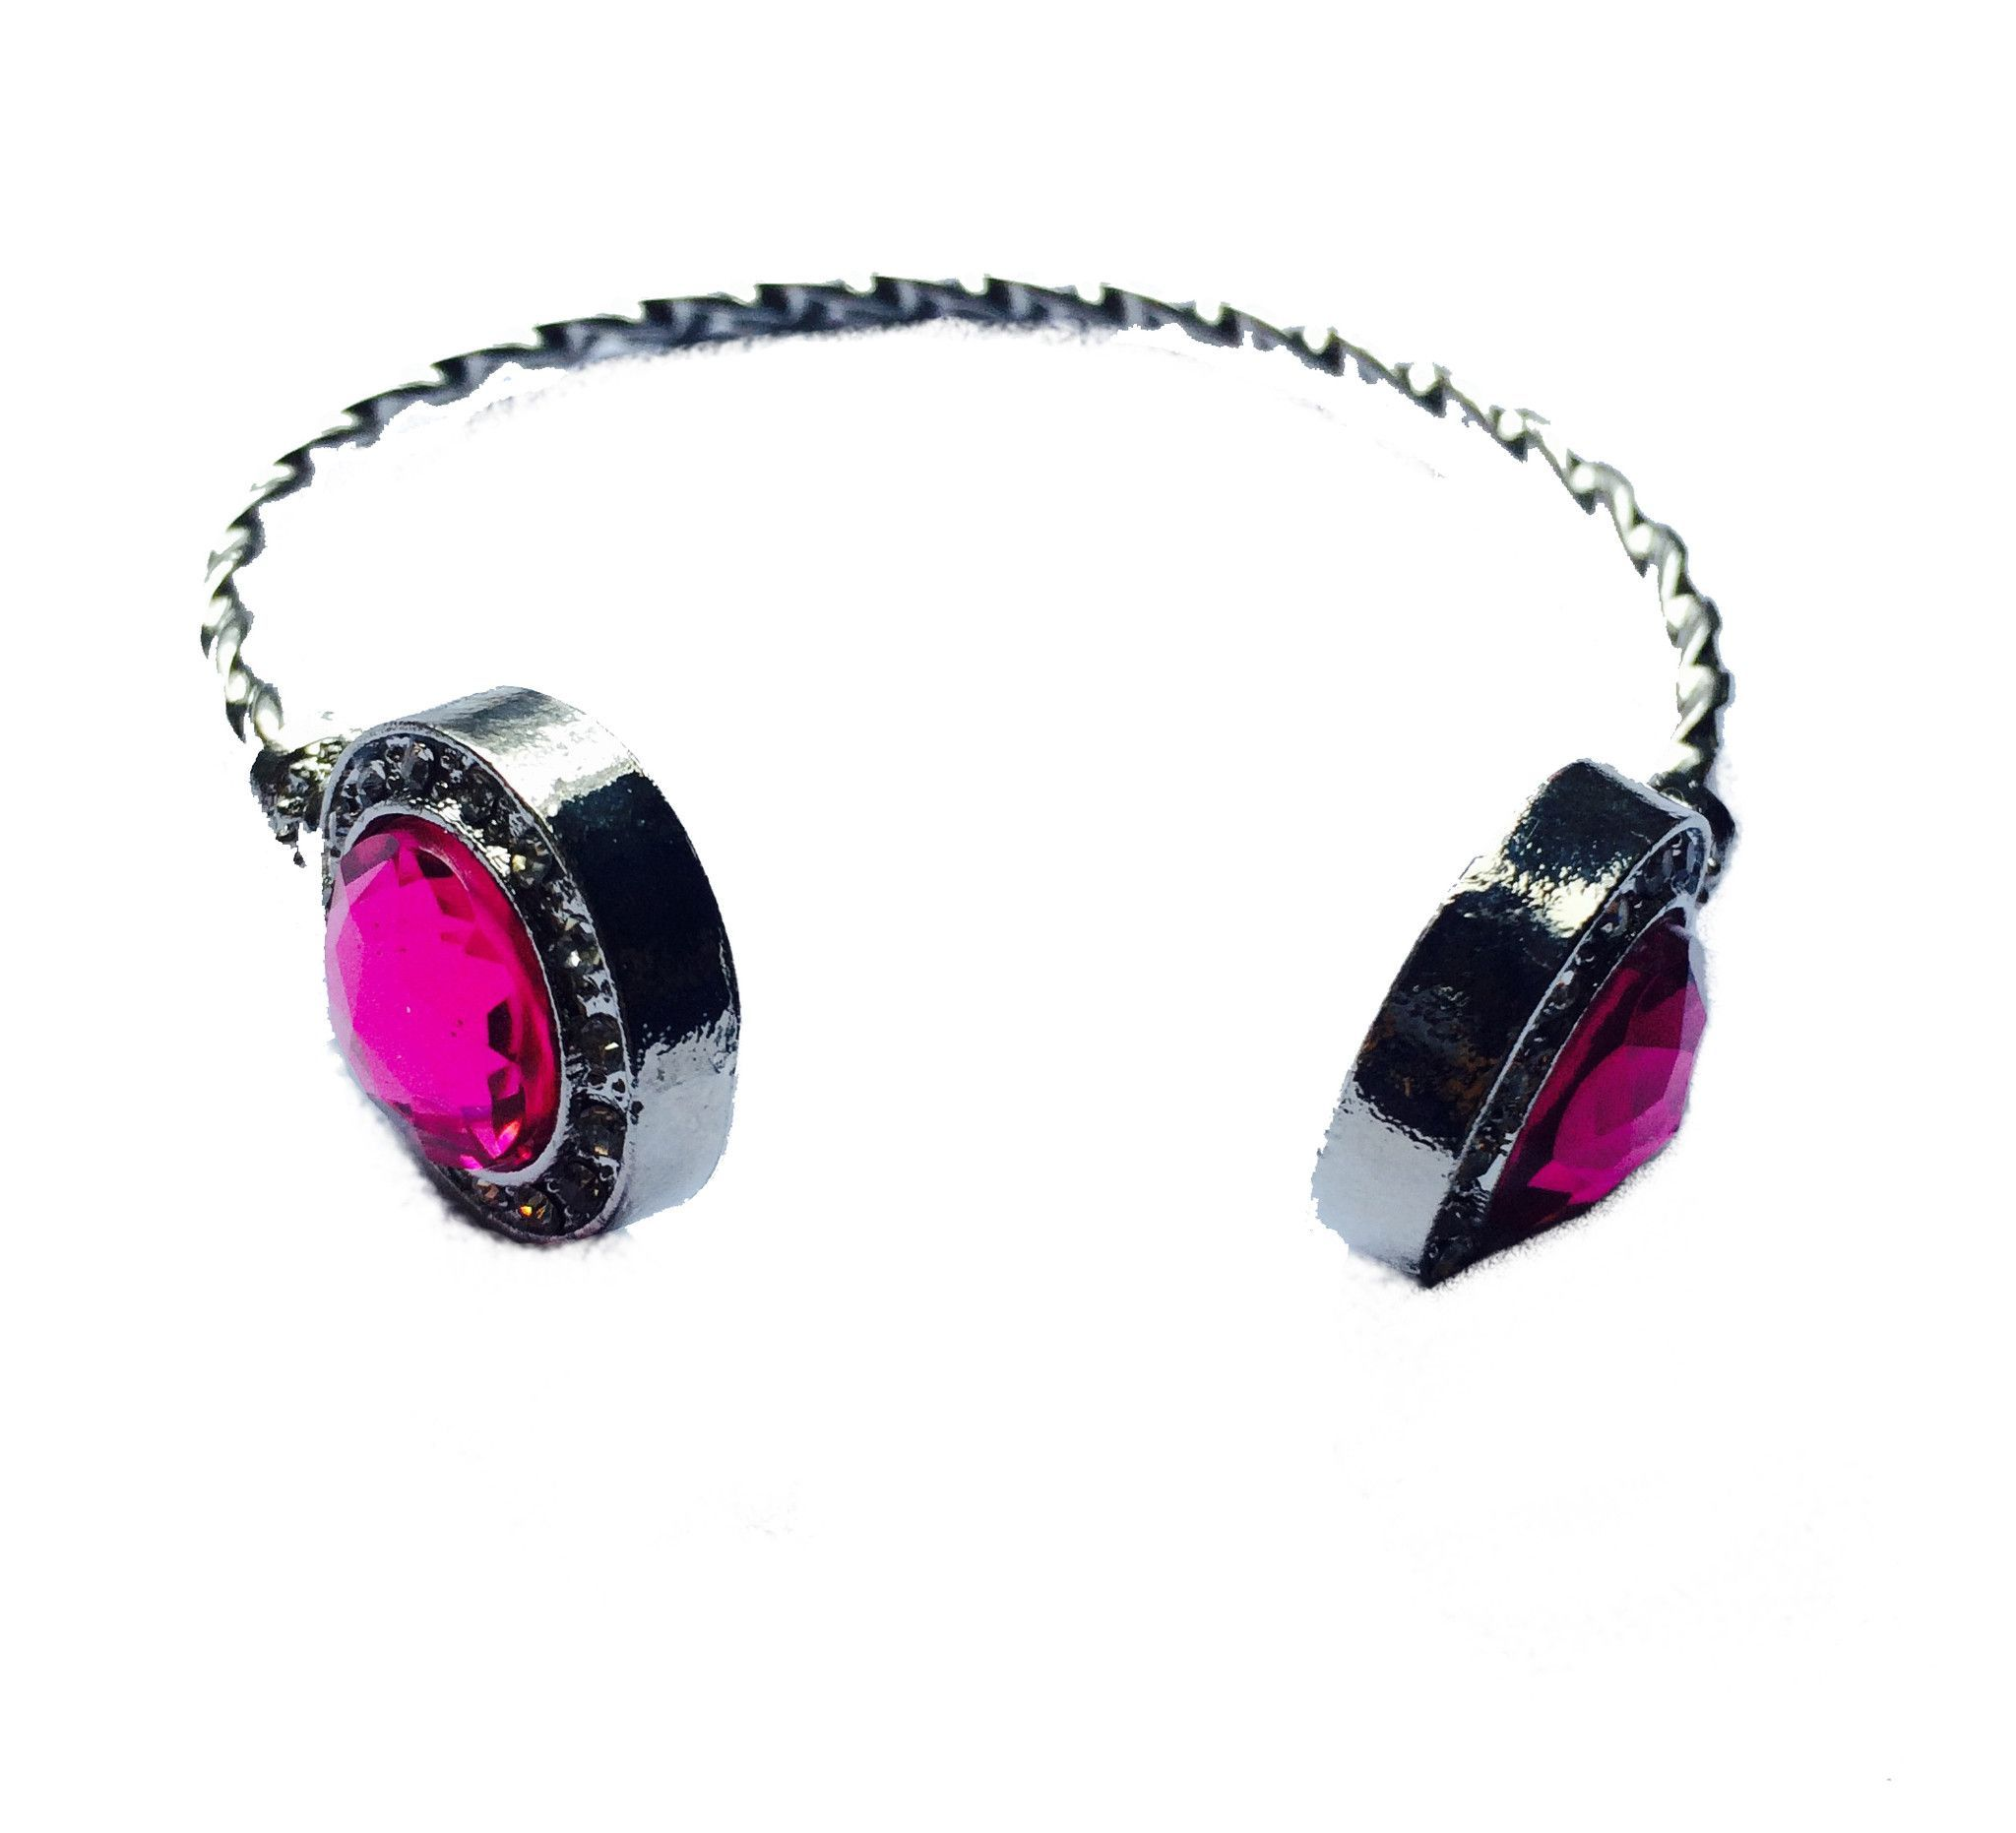 Magenta Haze necklace